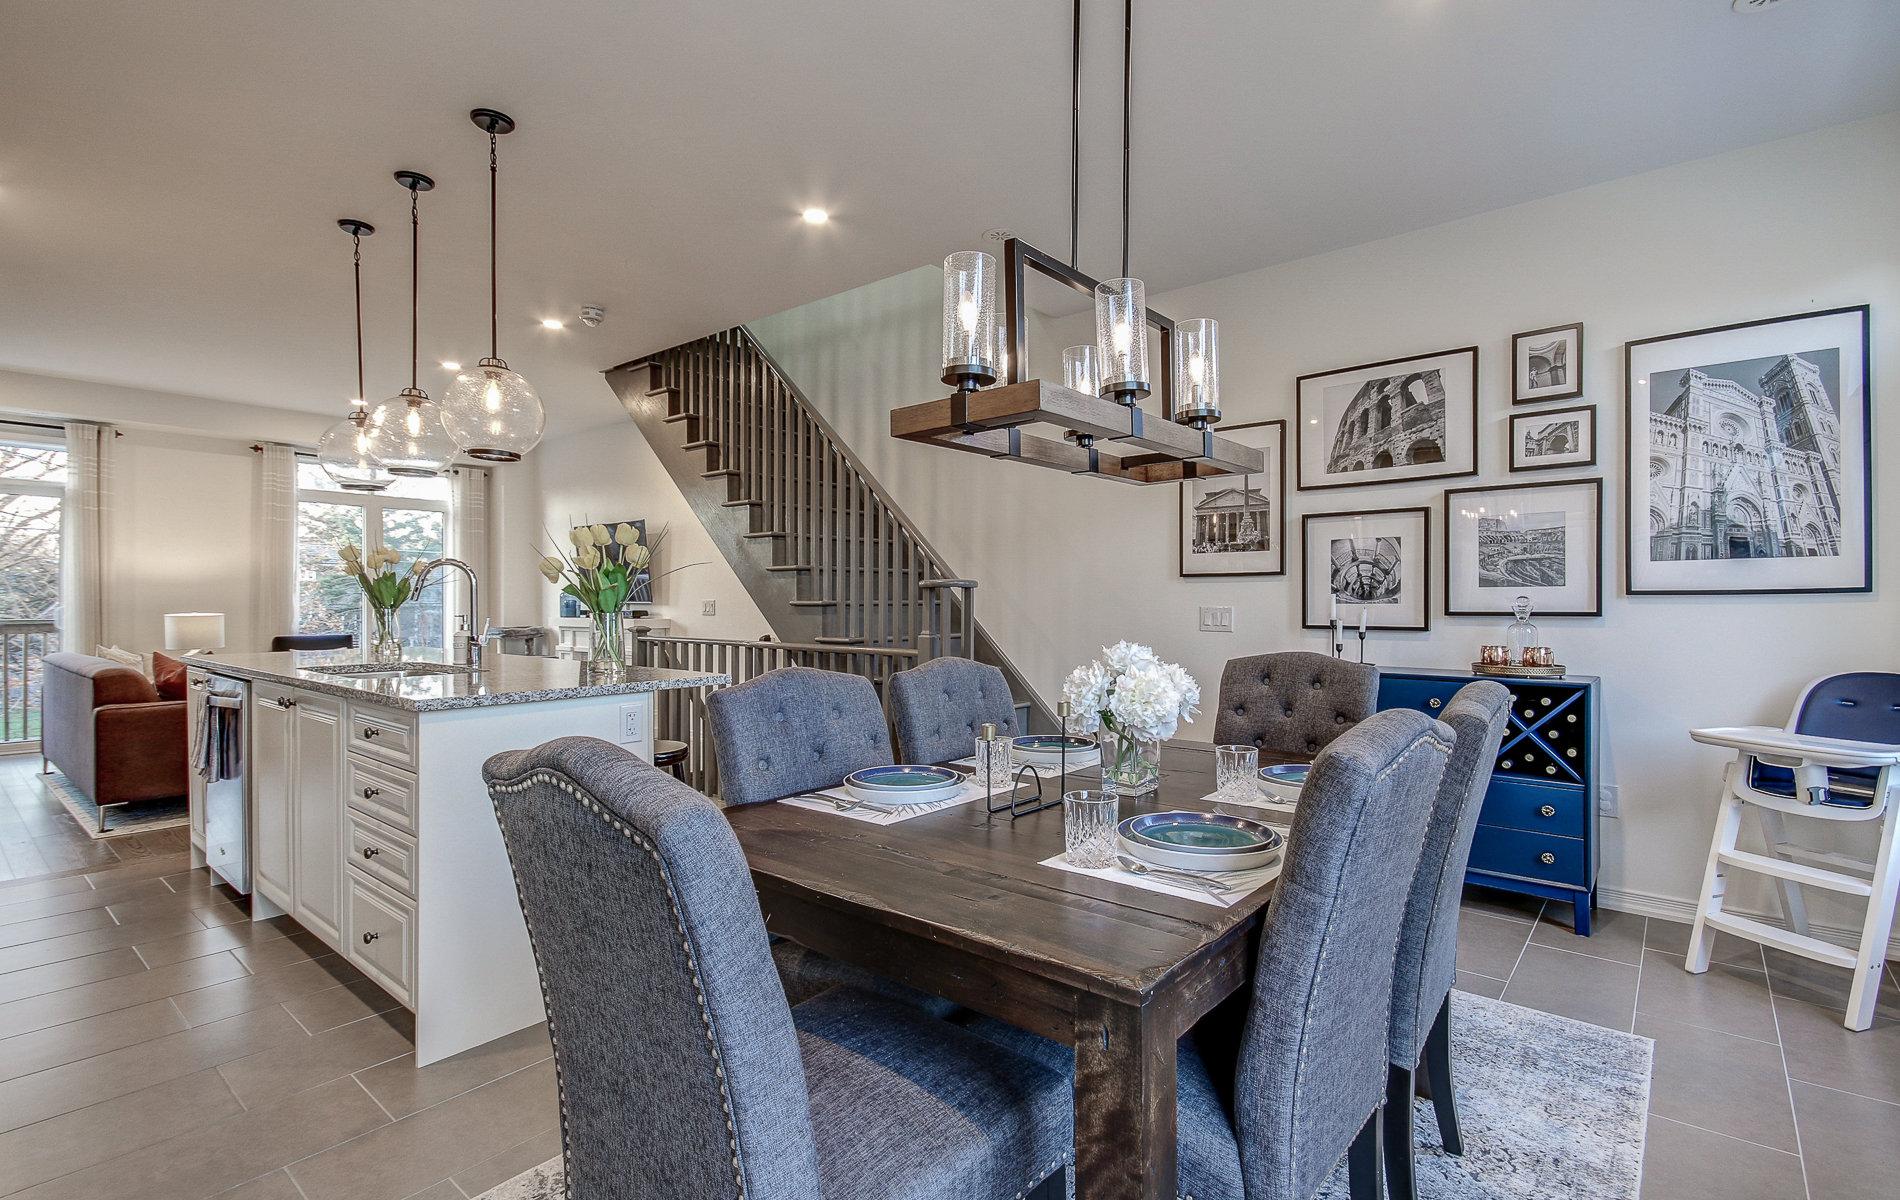 371 Ladycroft Terrace, Mississauga